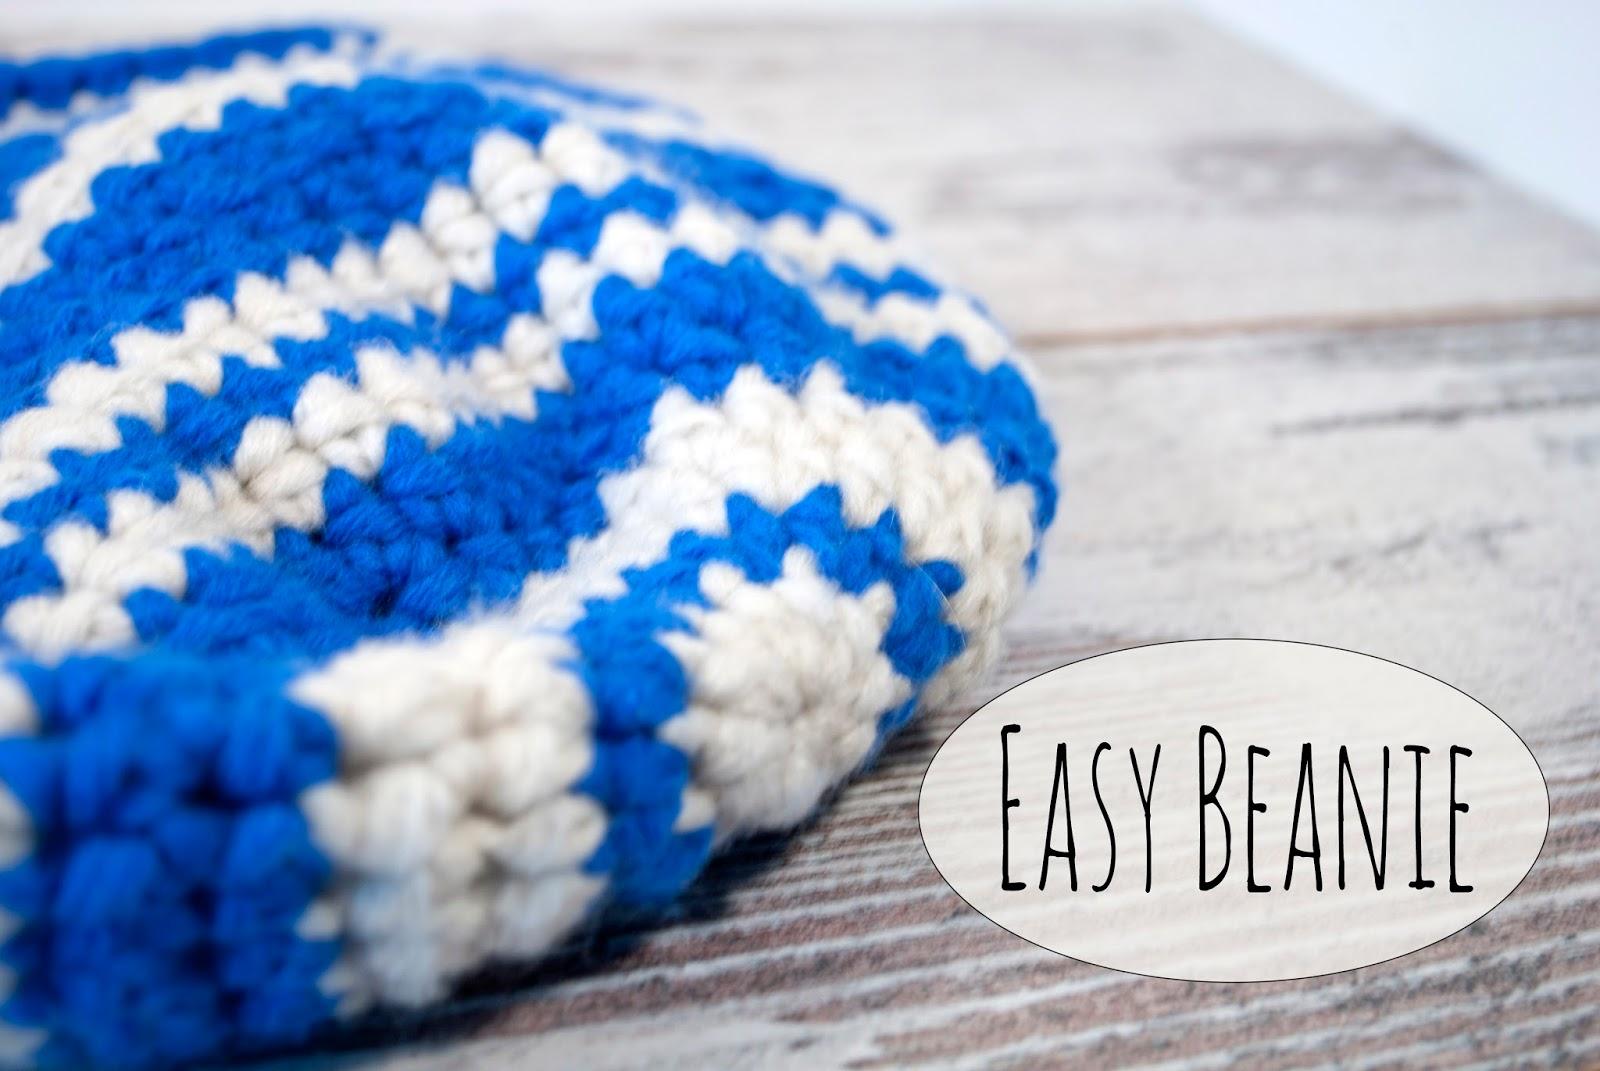 Easy Beanie - kostenloses Häkelmuster! * The Crafting Café